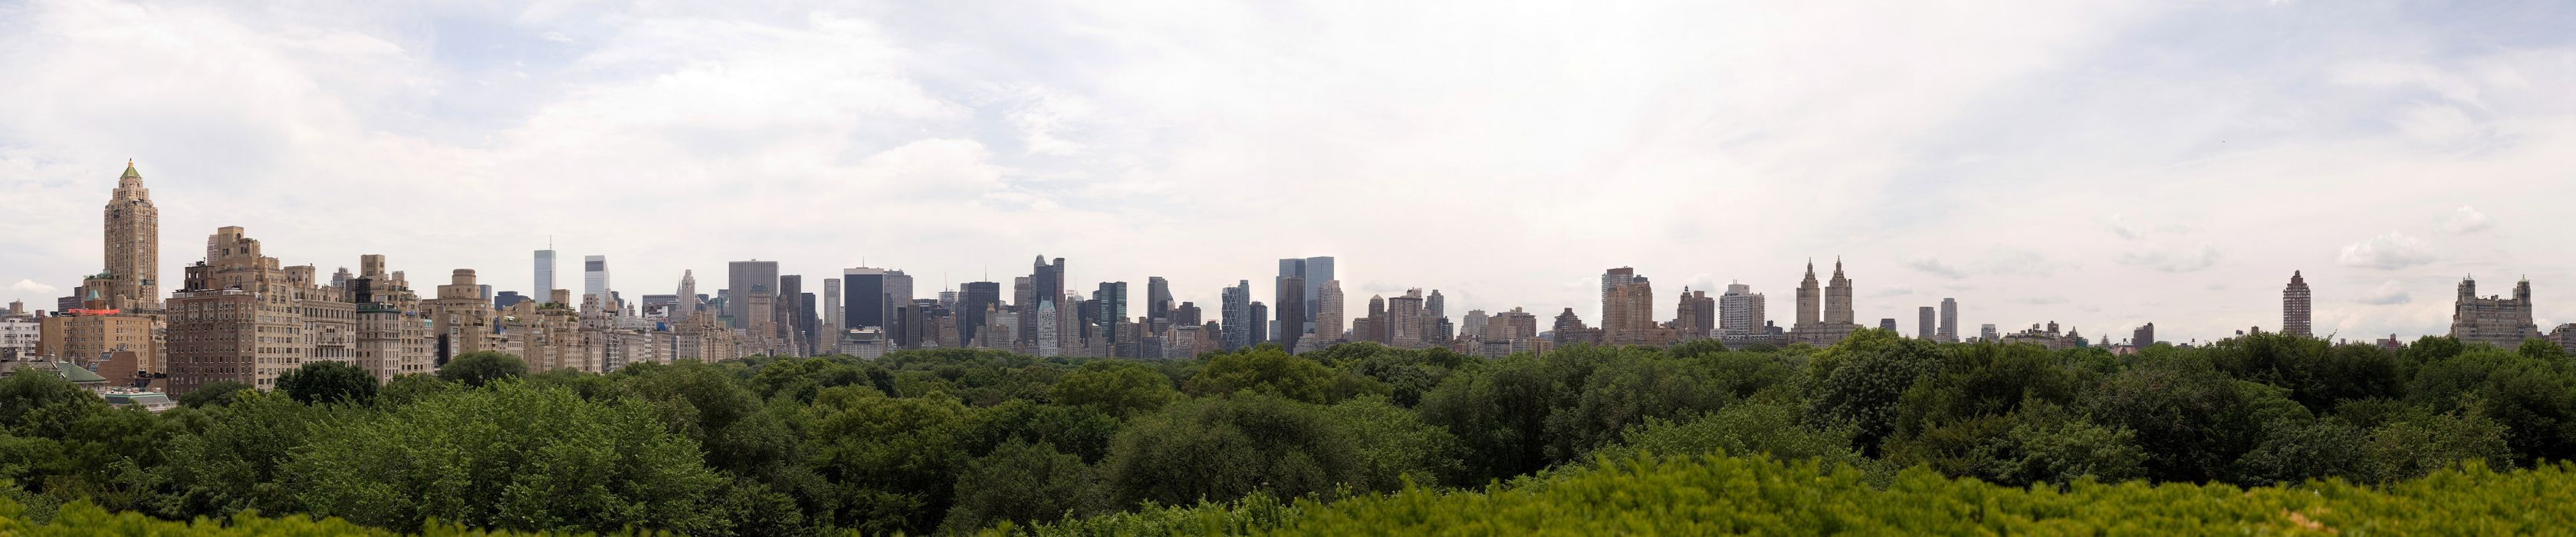 New York Manhattan Central Park wallpaper